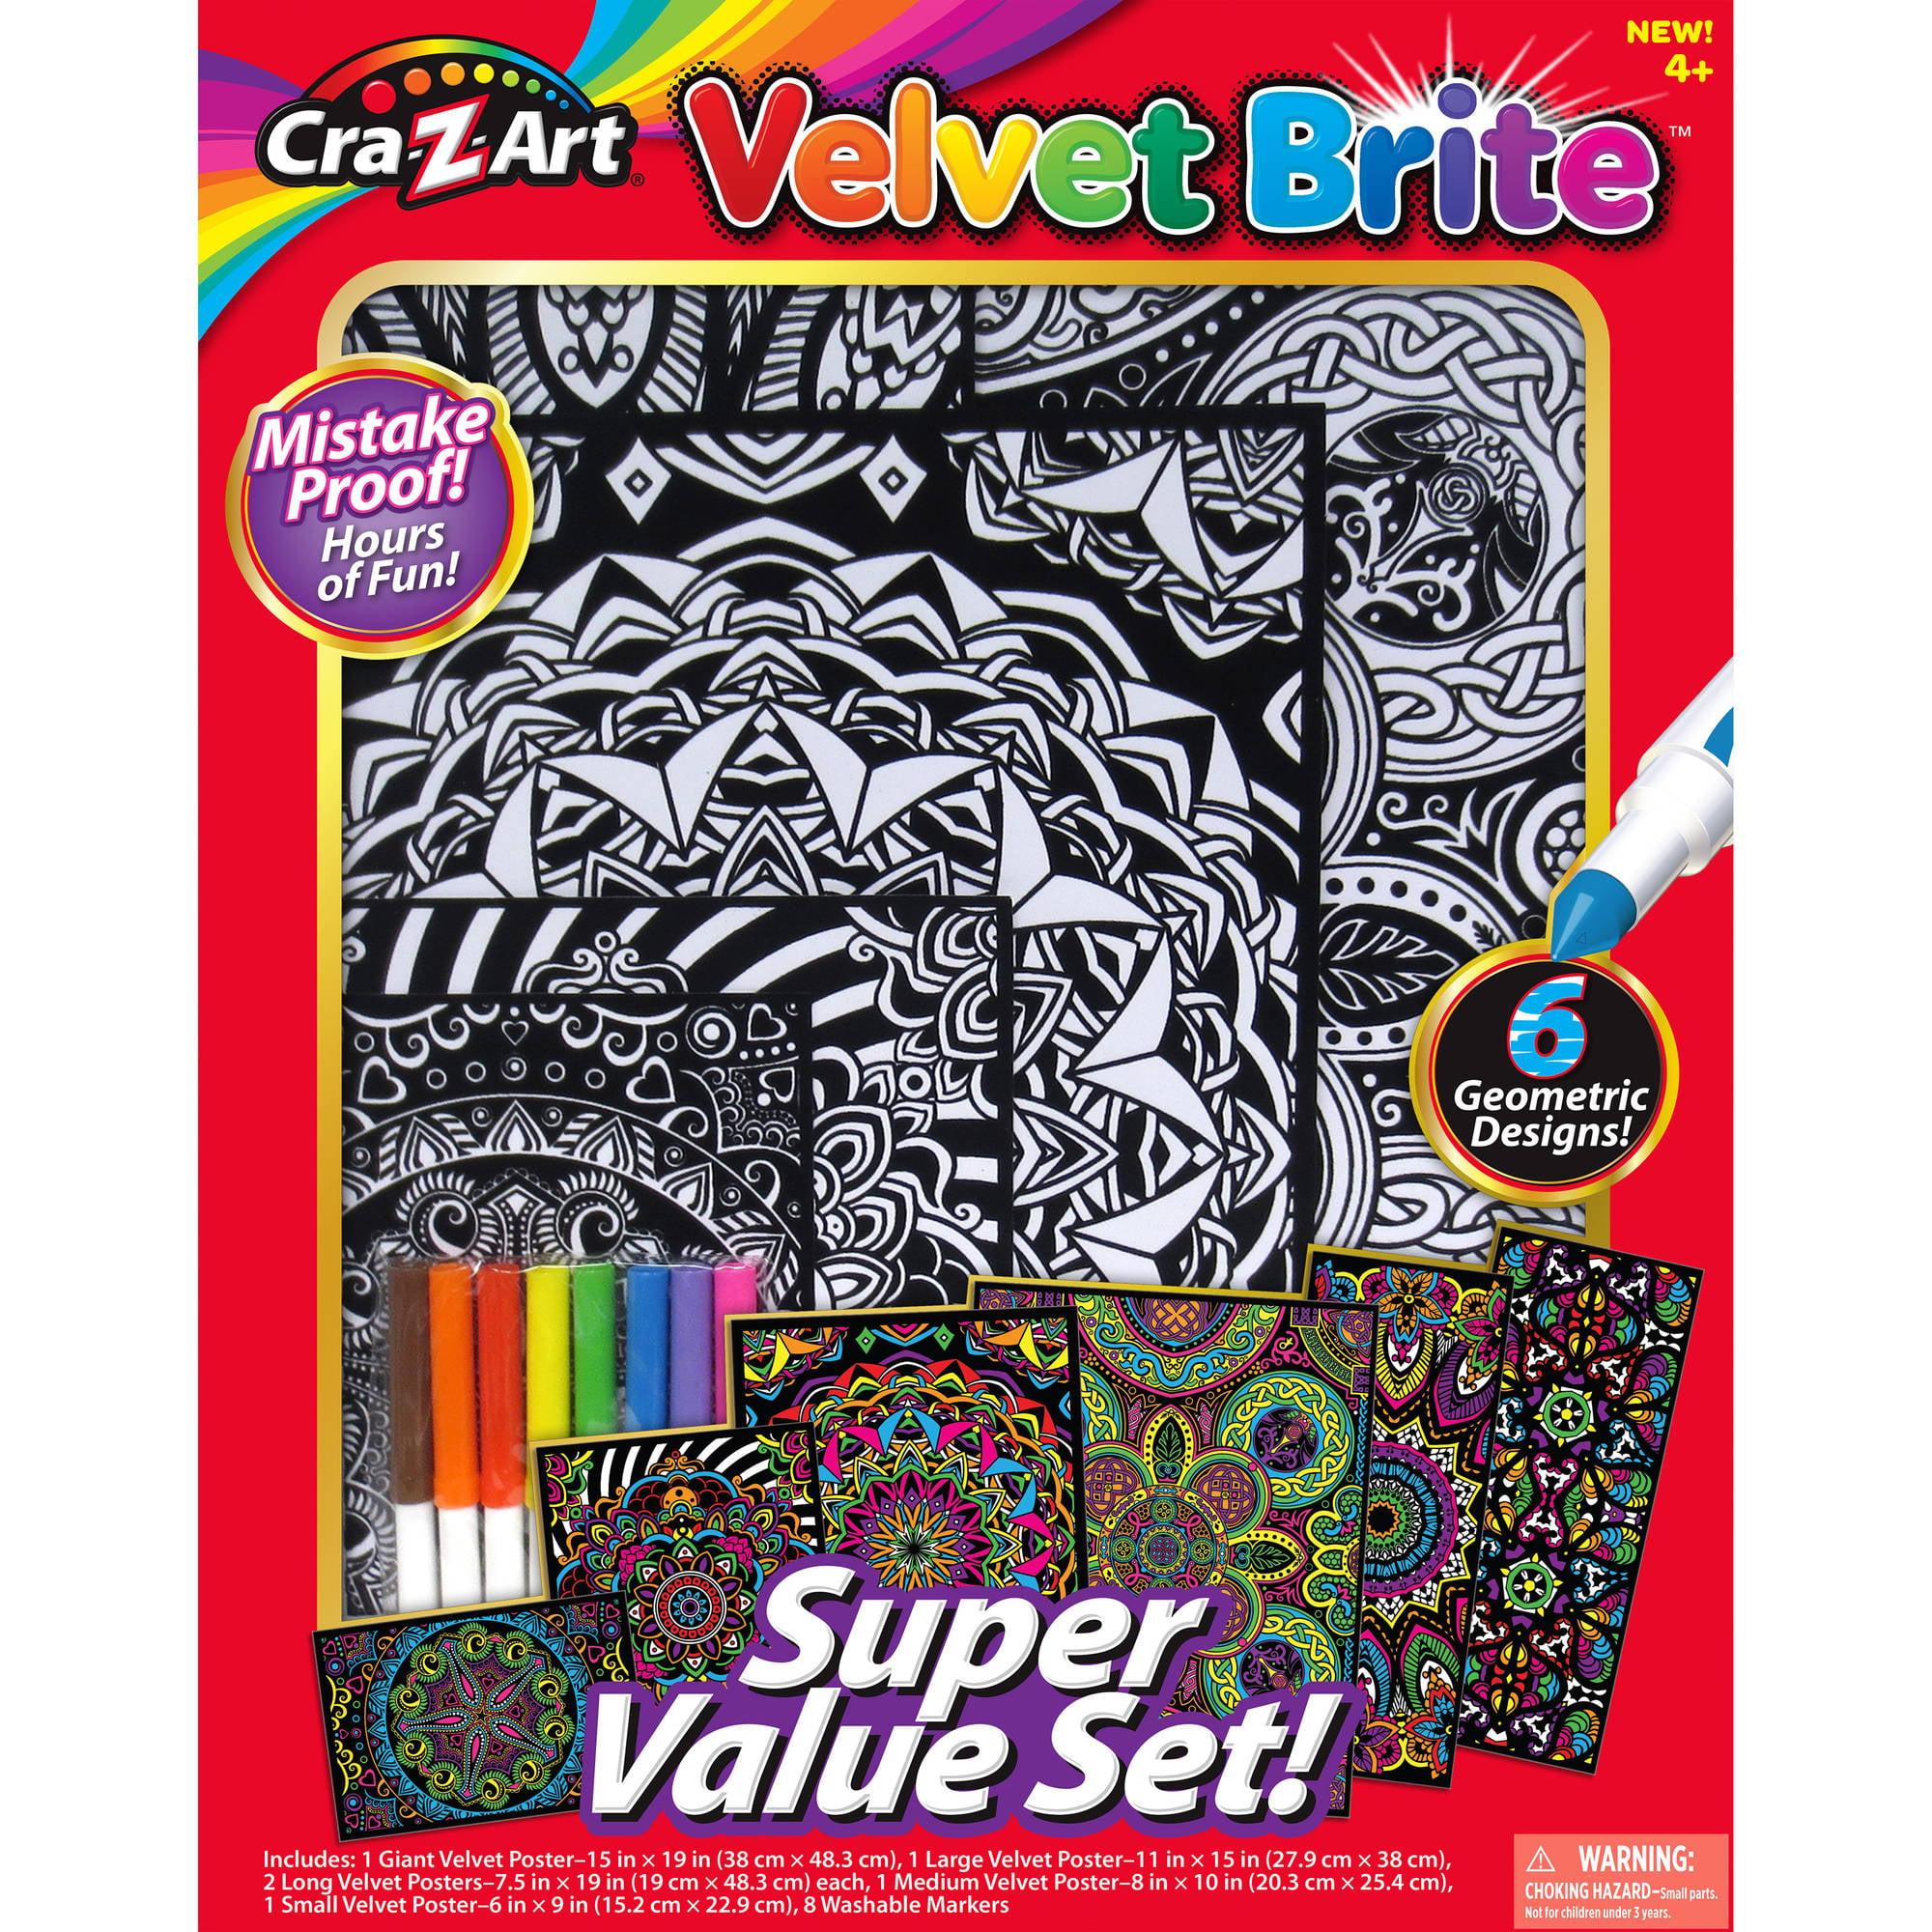 Cra-Z-Art VELVET BRITE SUPER VALUE SET by LaRose Industries, LLC